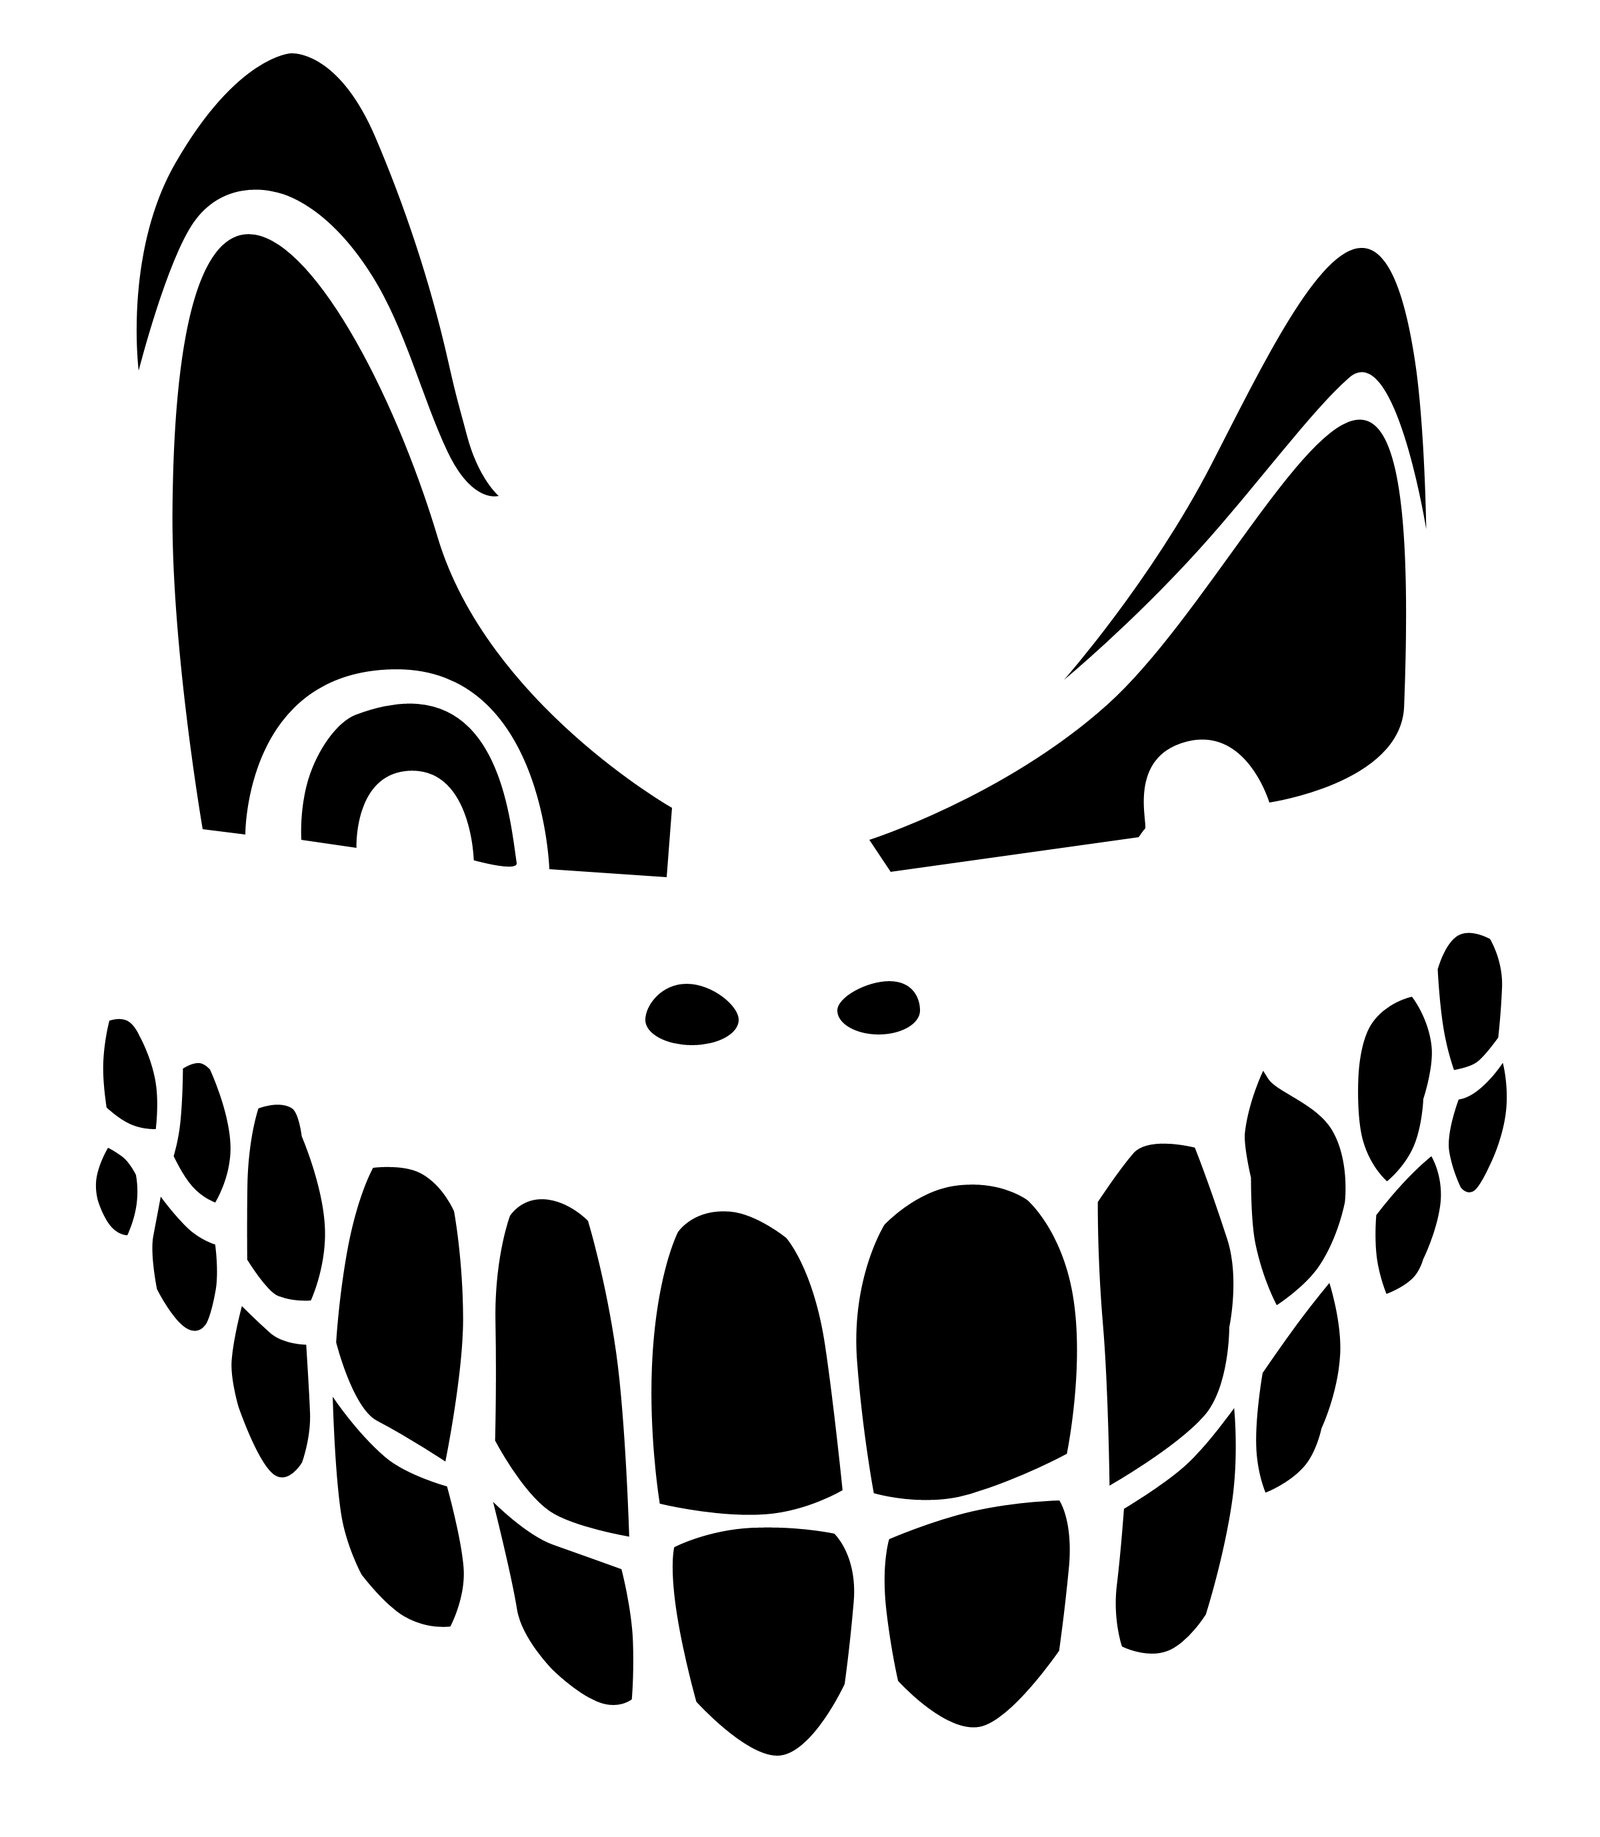 Top 100+ Jack O Lantern Faces Patterns Stencils Ideas | Halloween - Free Printable Pumpkin Carving Stencils For Kids